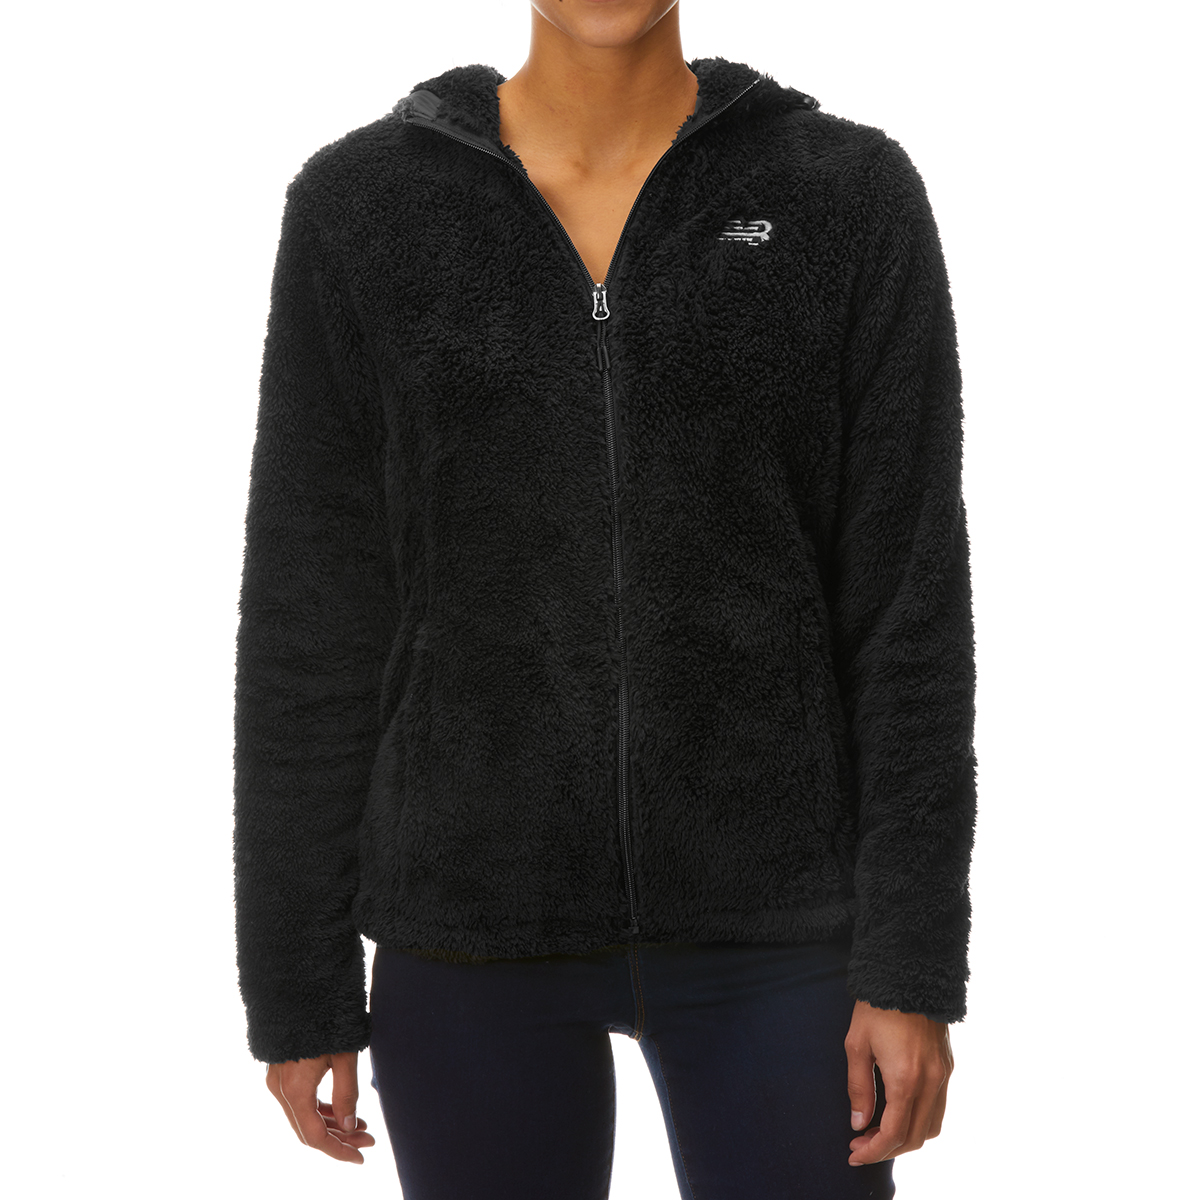 New Balance Women's Full Zip Sherpa Hooded Jacket - Black, L